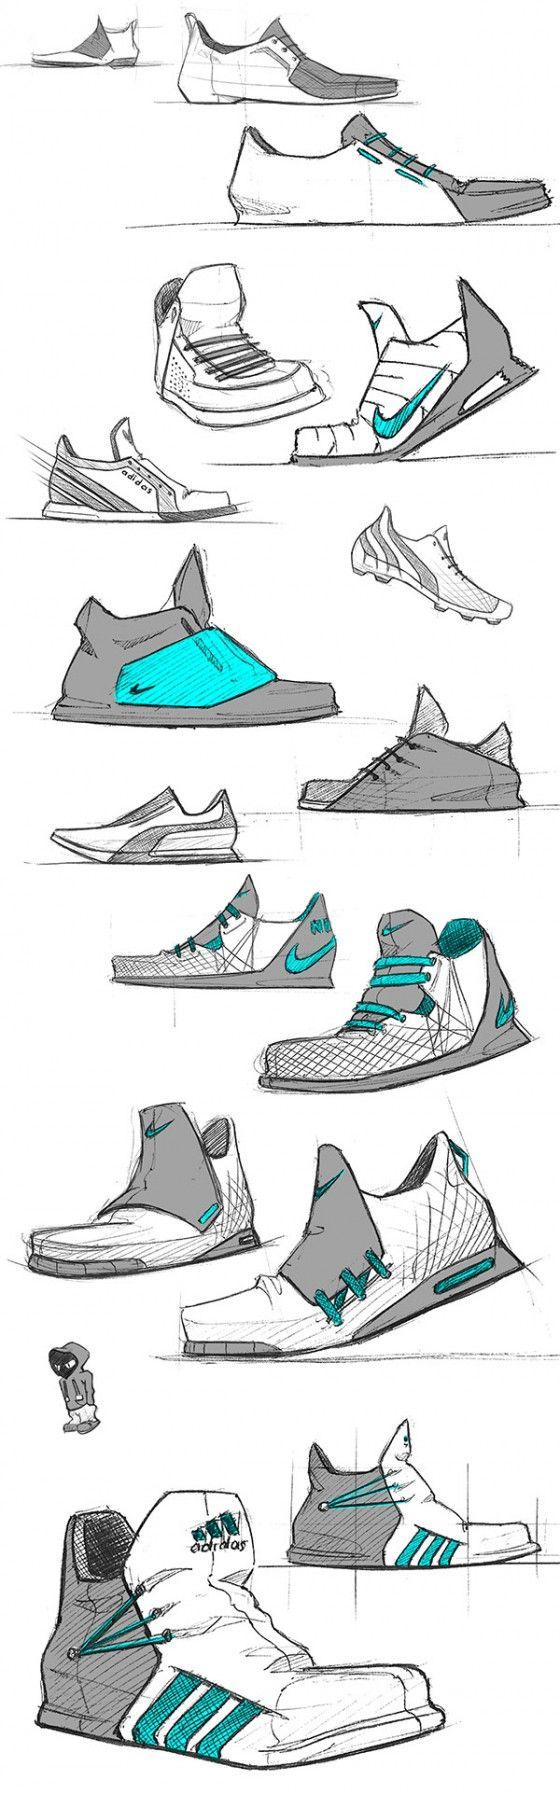 julien_fesquet_1 Footwear sketching references in 2019